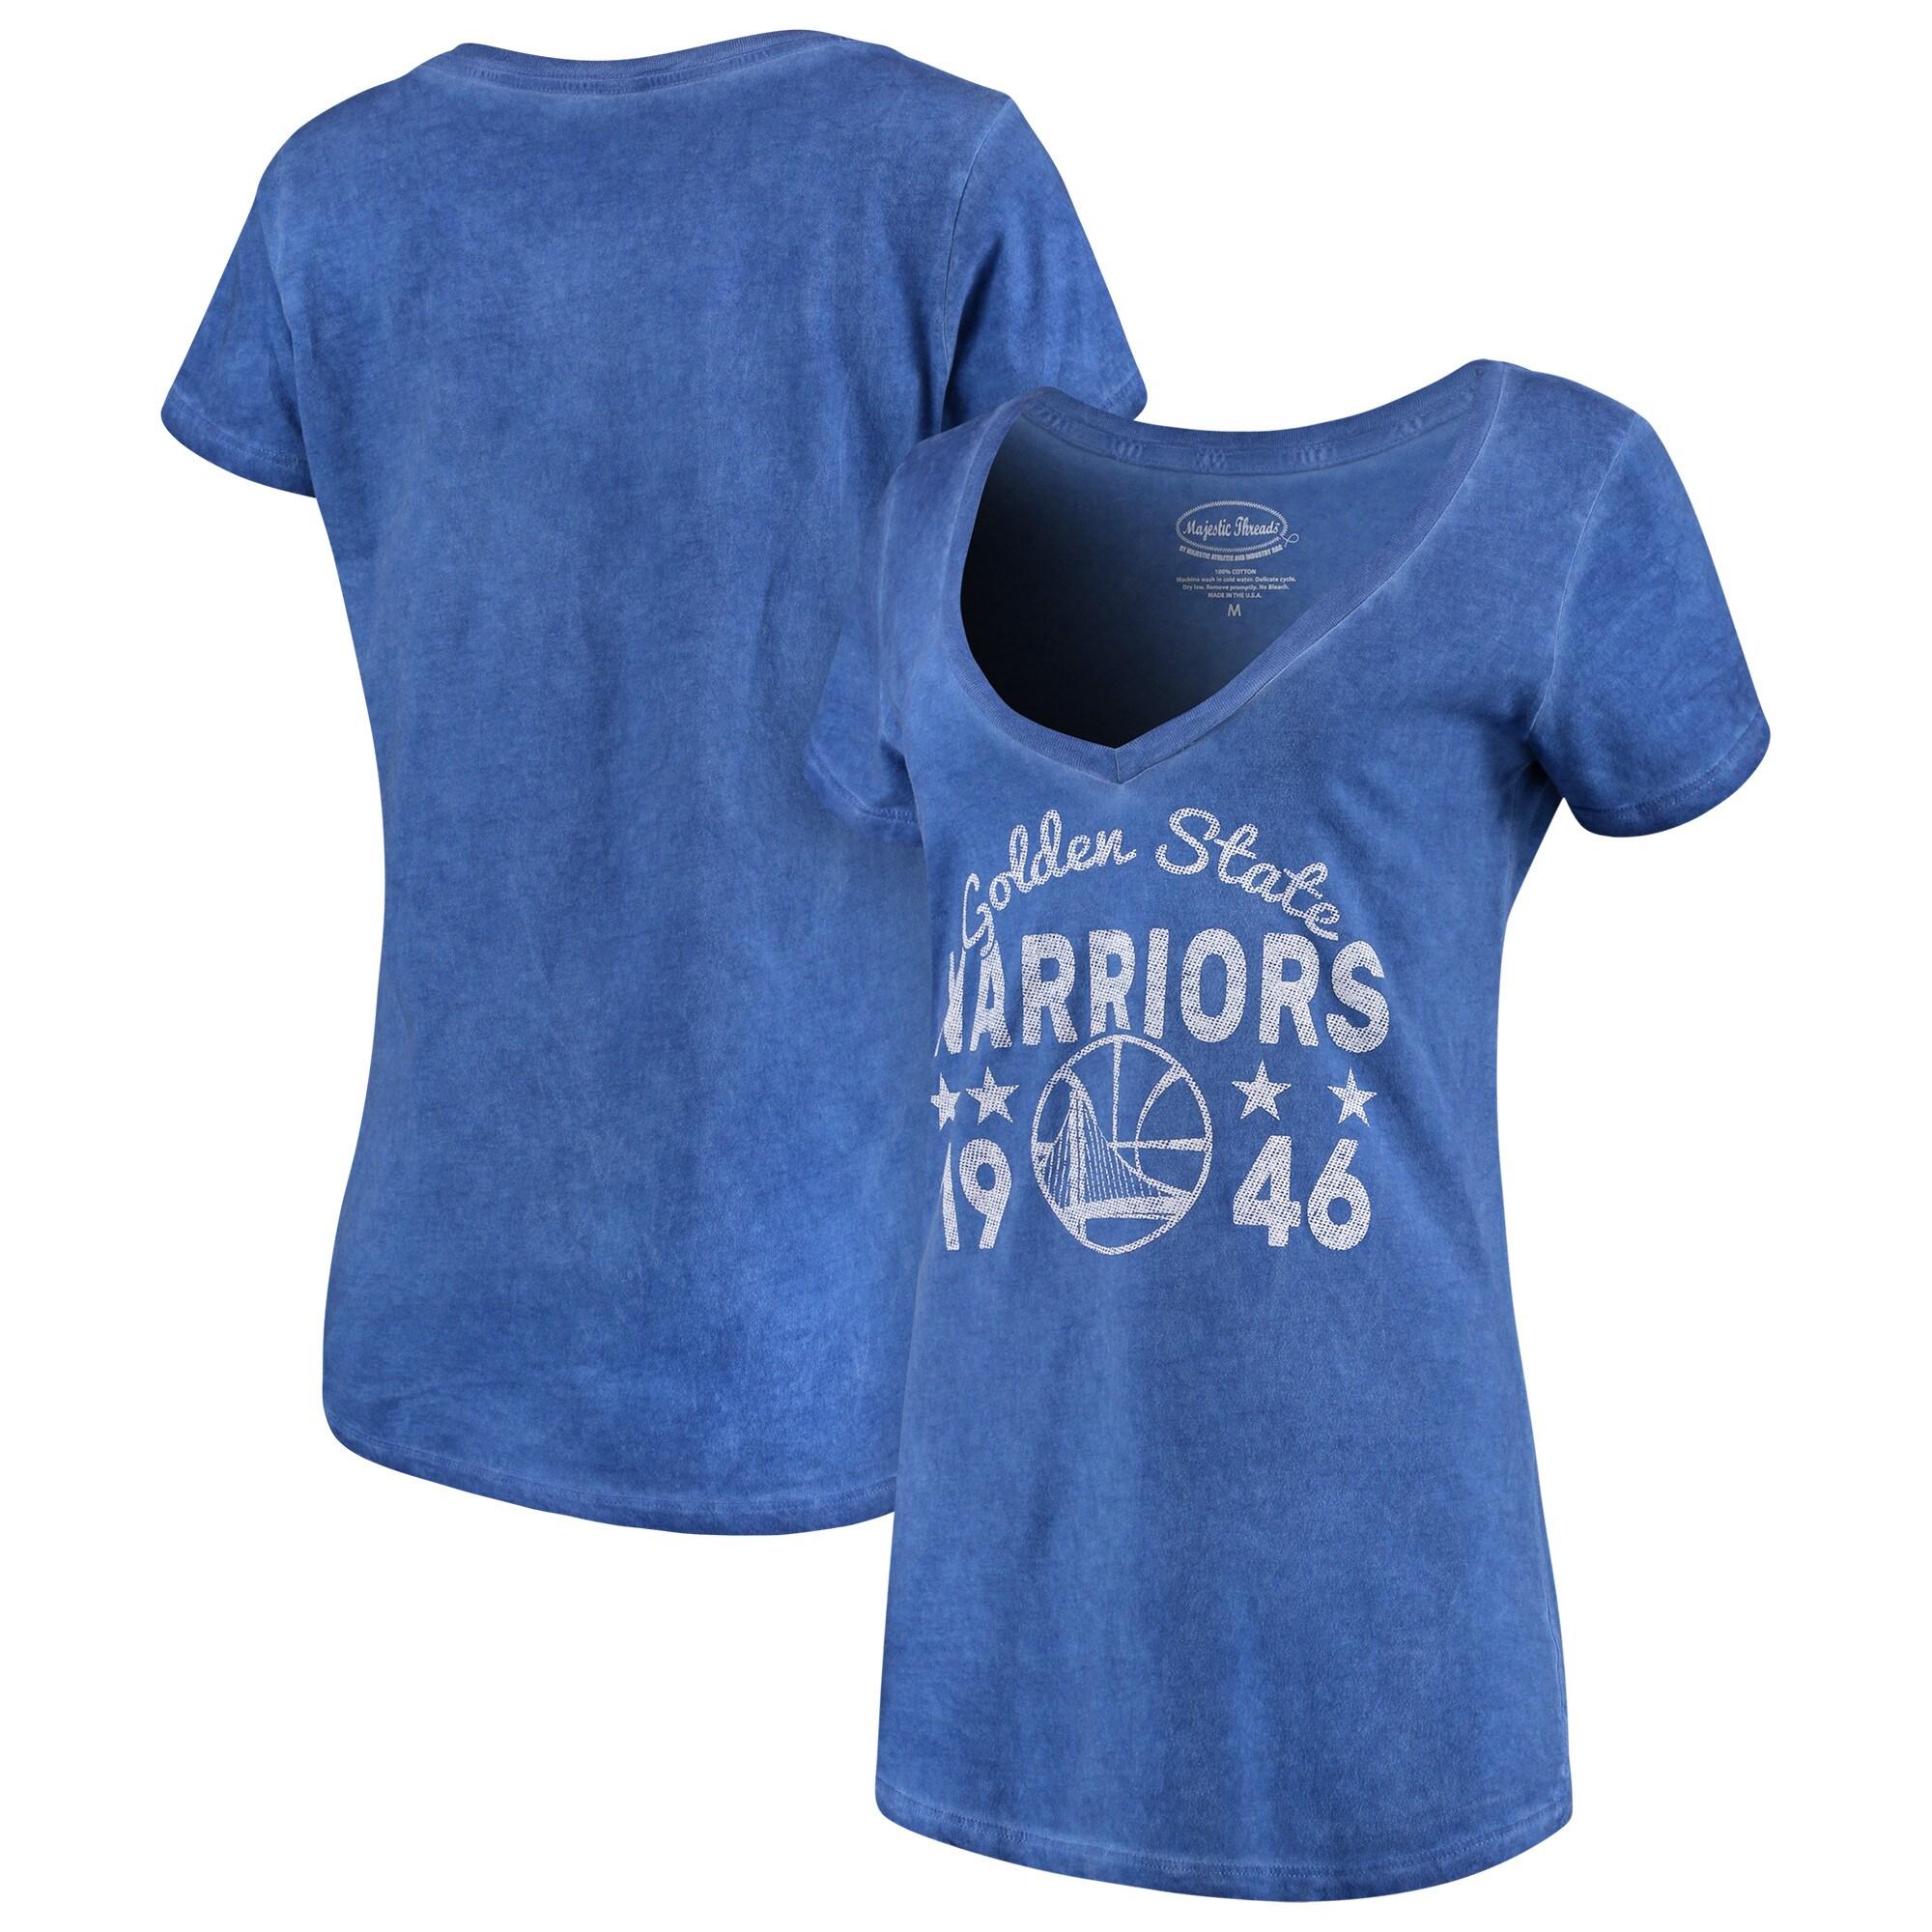 Golden State Warriors Majestic Threads Women's City Over Pop Premium V-Neck T-Shirt - Royal